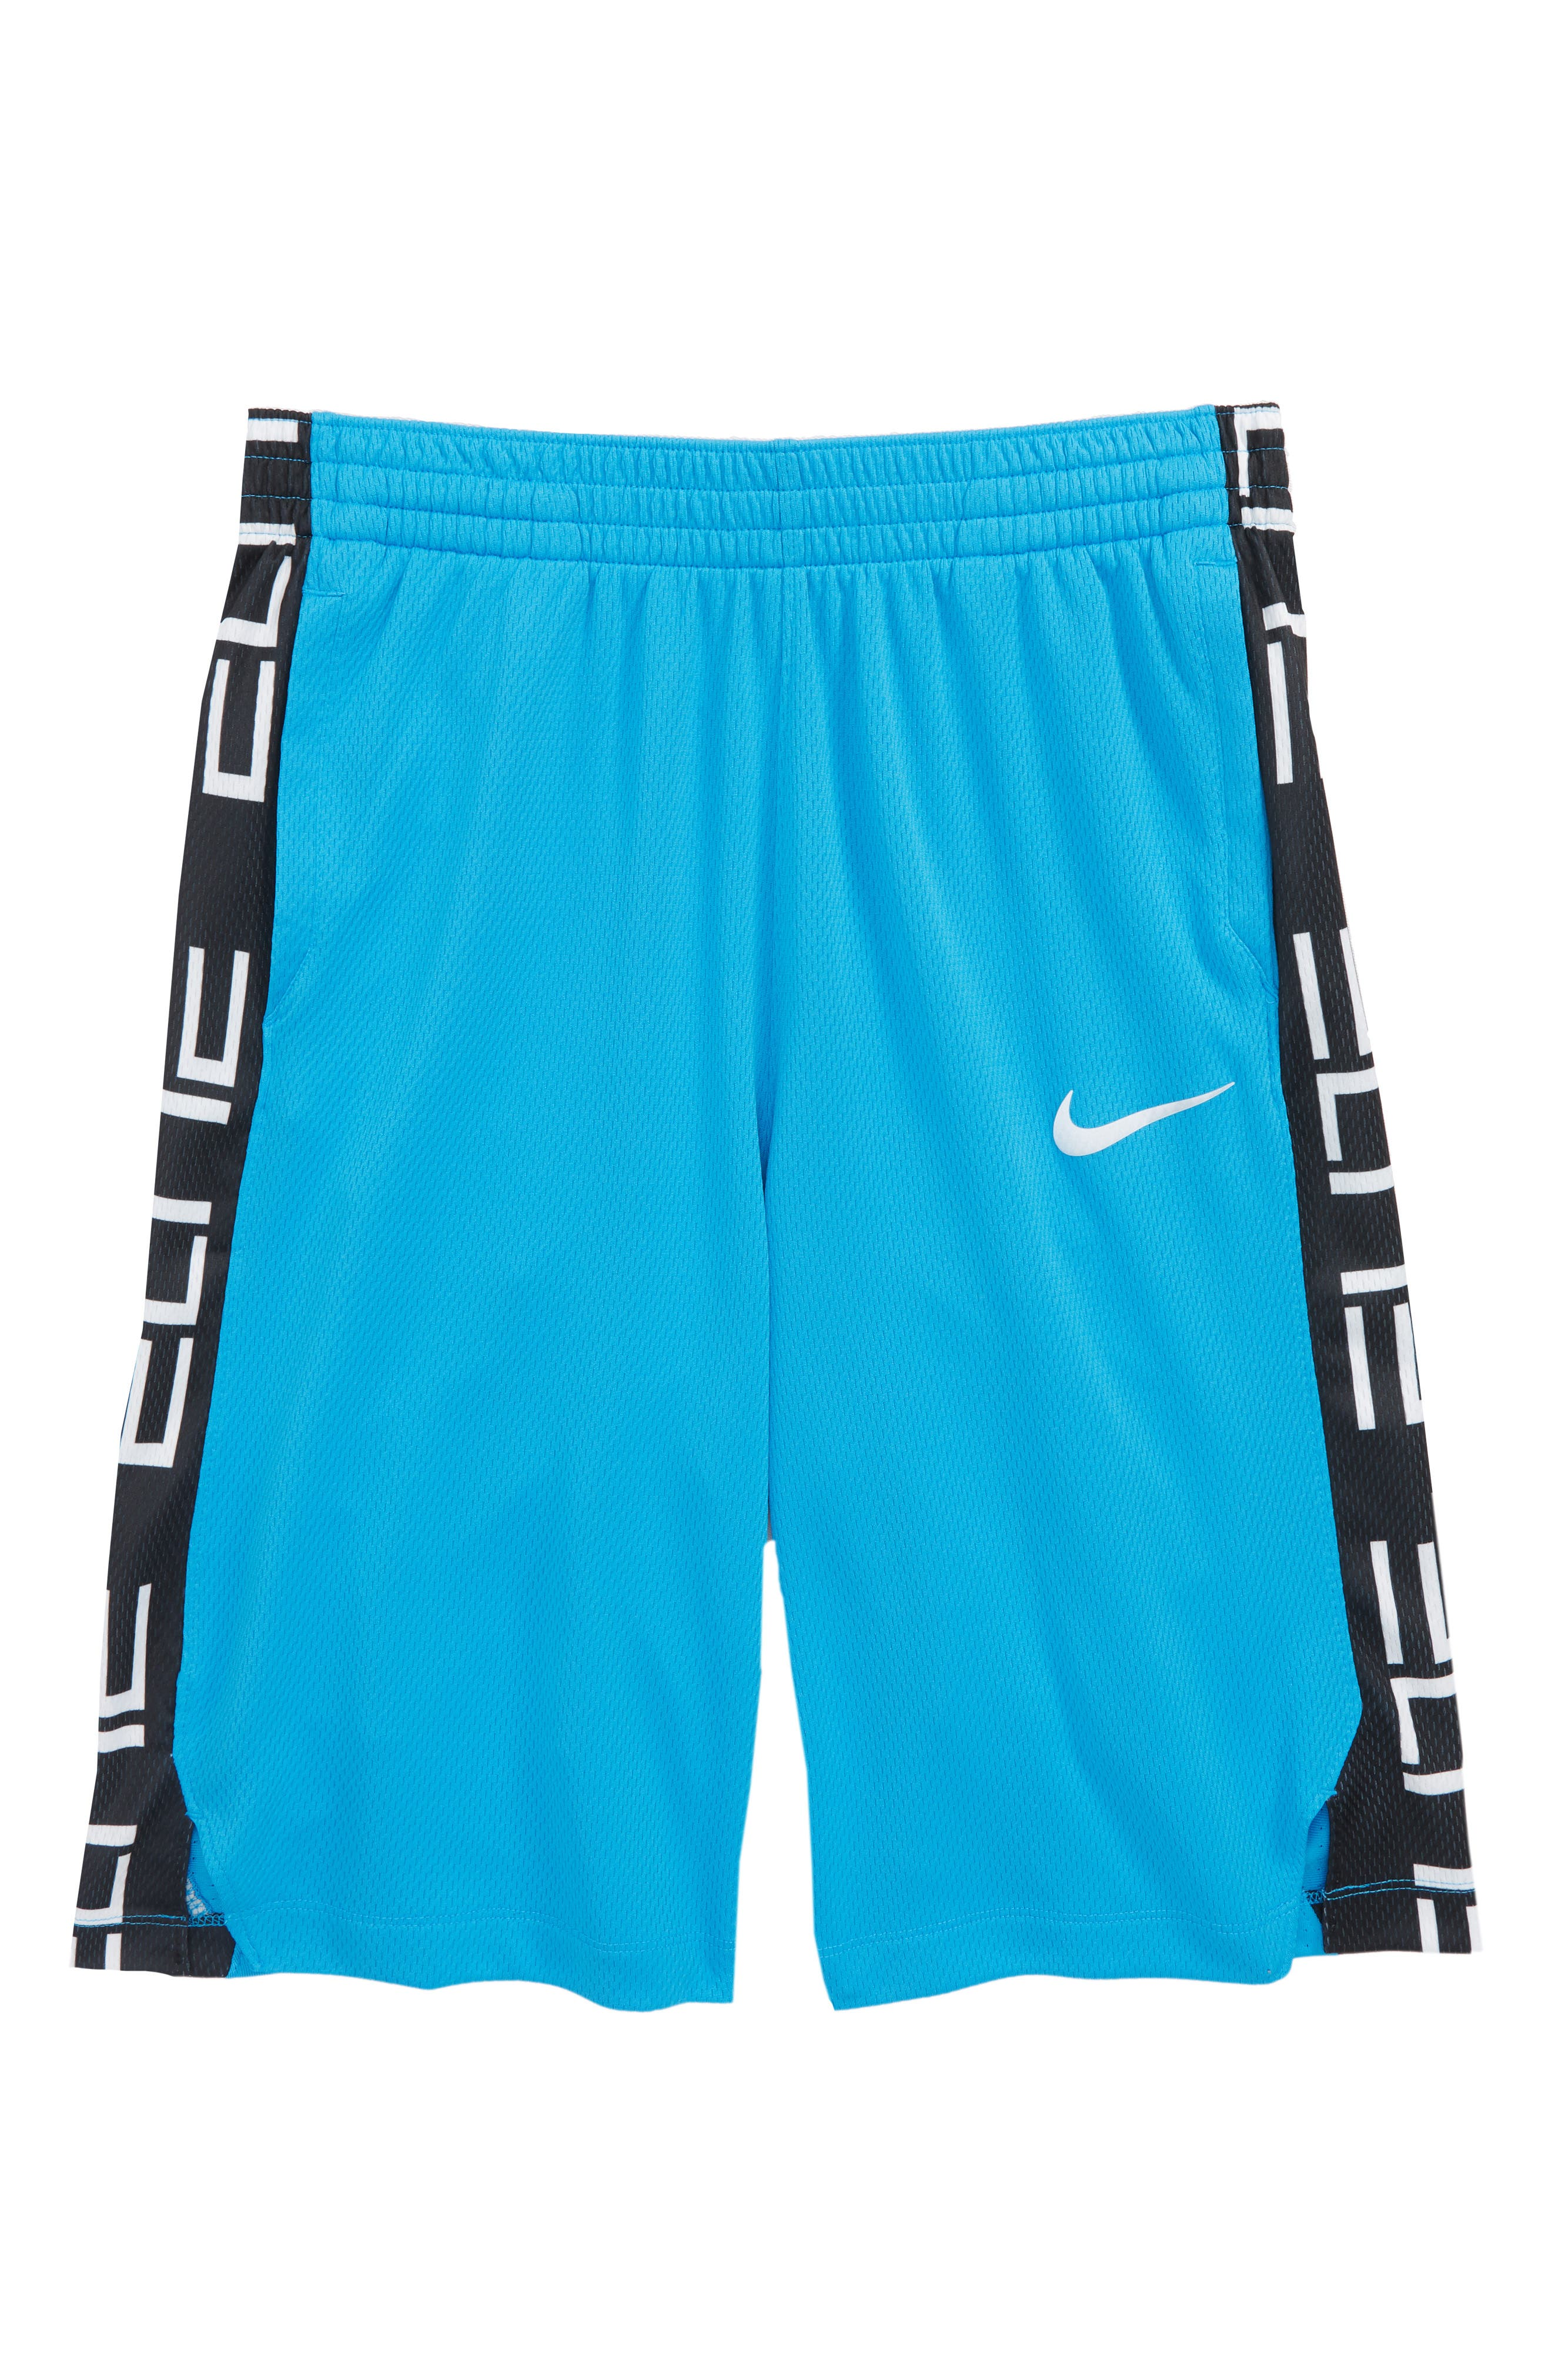 Dry Elite Shorts,                         Main,                         color, Equator Blue/ White